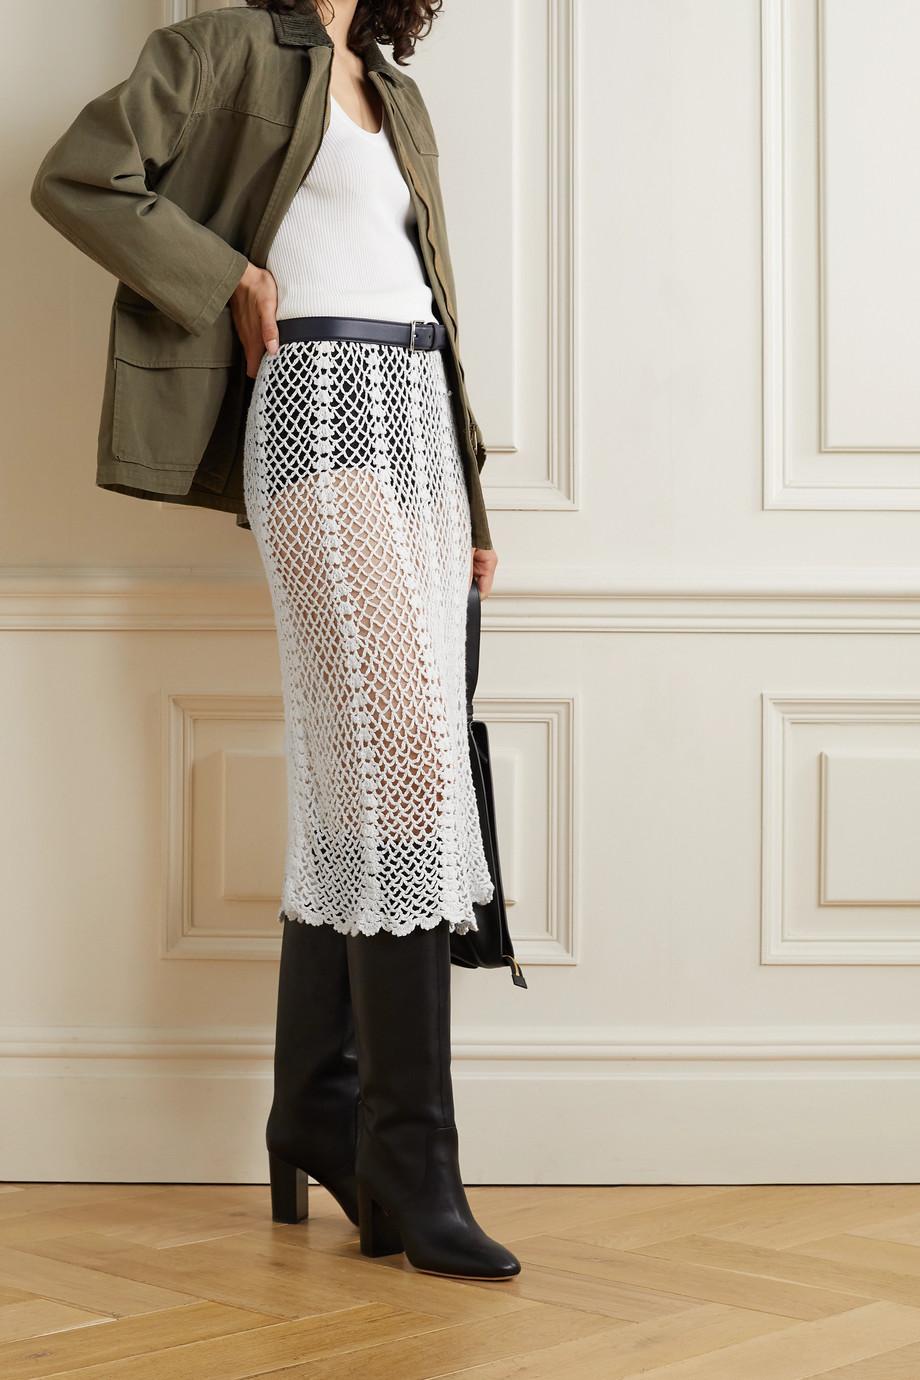 Nili Lotan Zuria crocheted cotton skirt